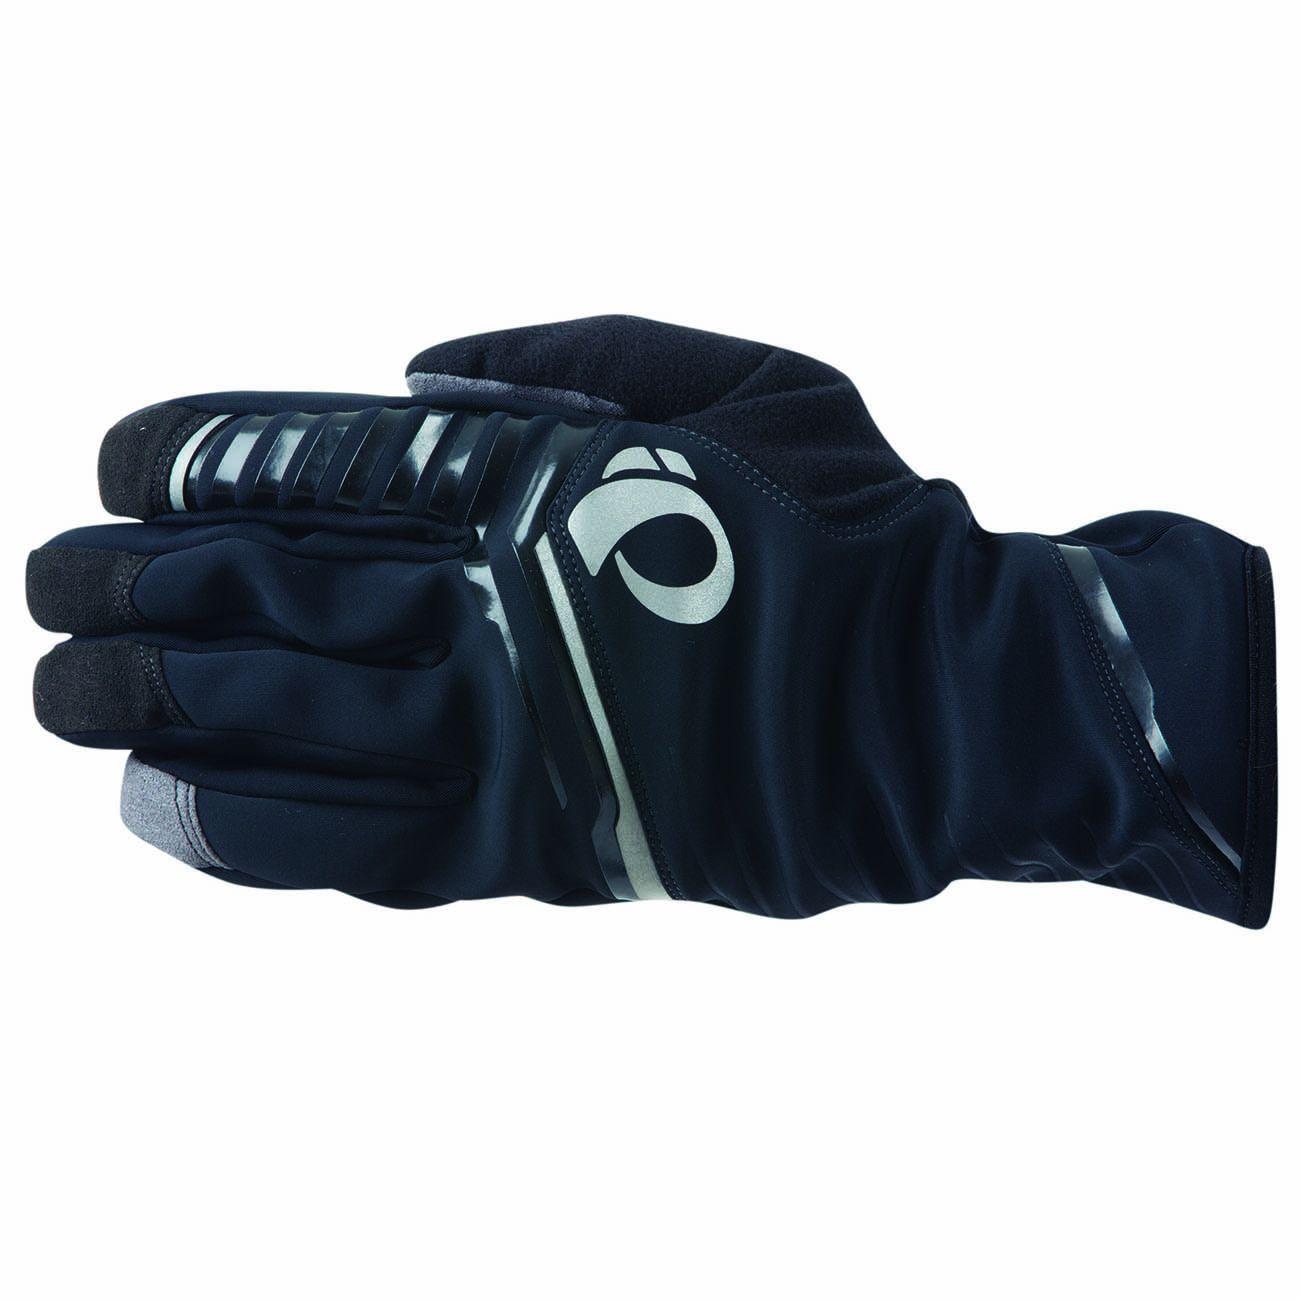 PEARL iZUMi PRO AMFIB rukavice, černá, M